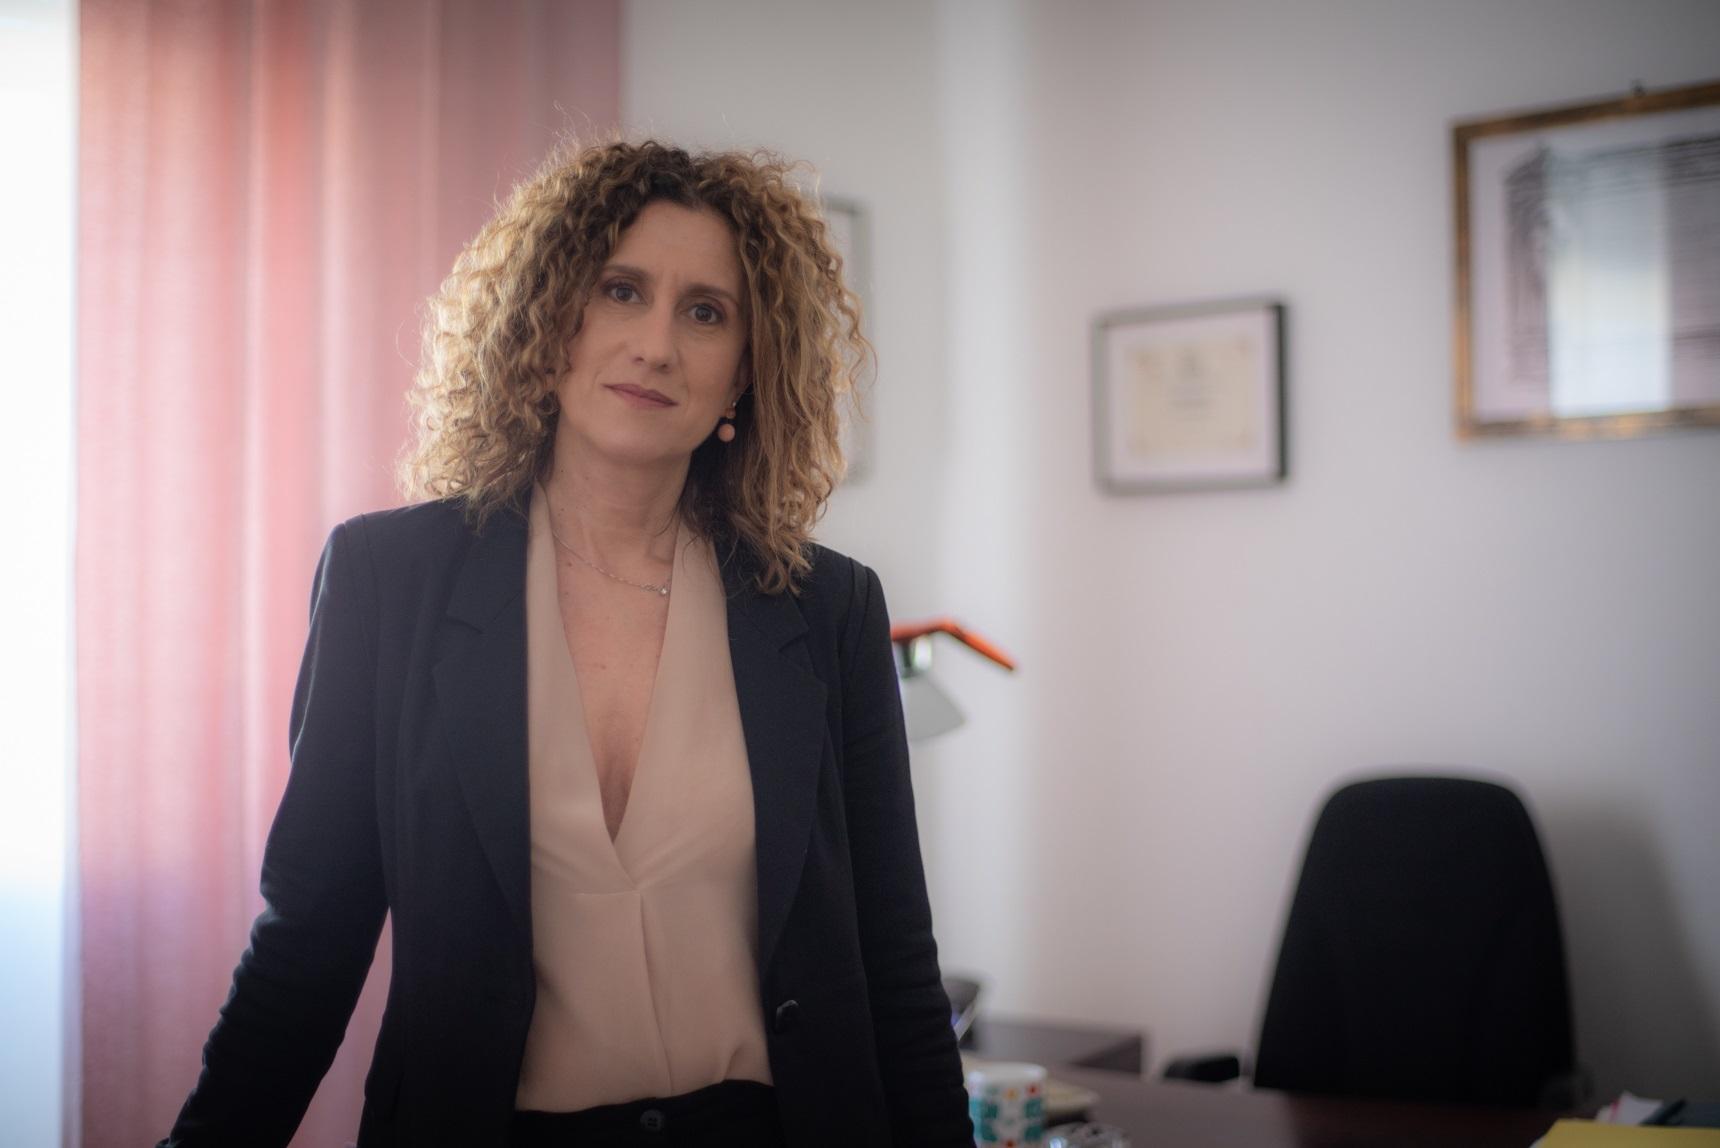 Avvocato Francesca Sbriccoli di Macerata